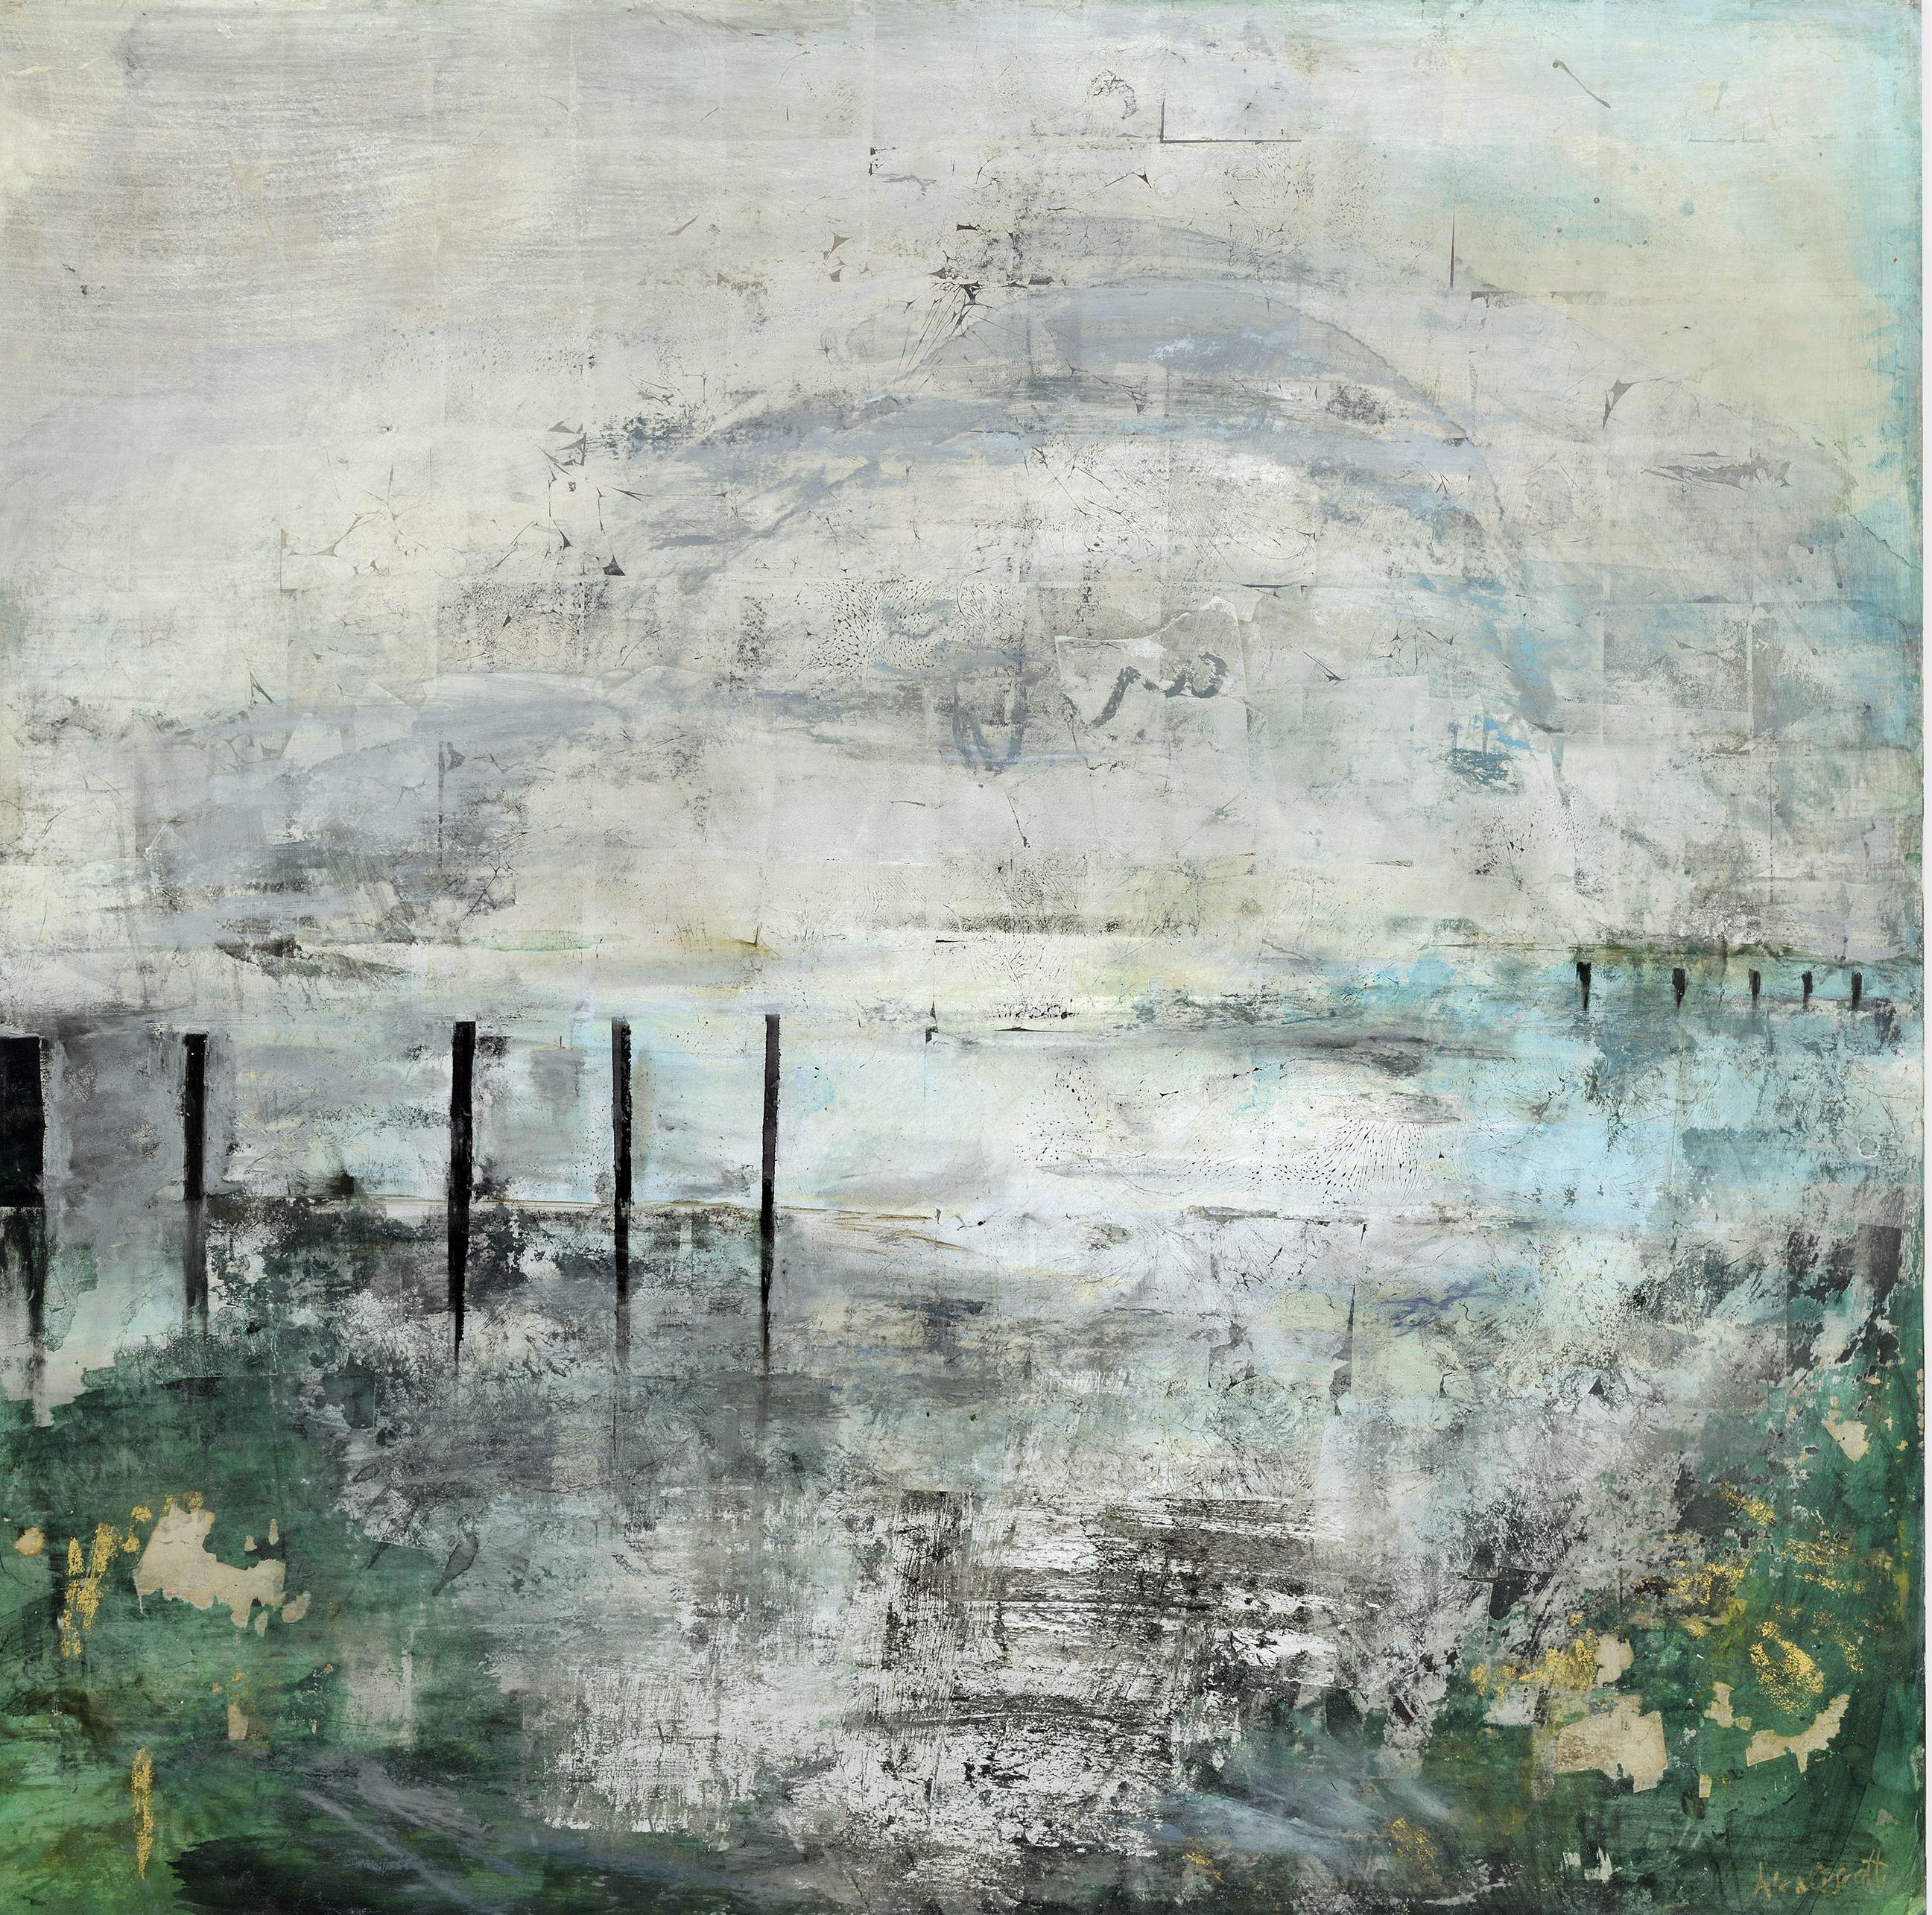 Summer's Day by Alice Cescatti